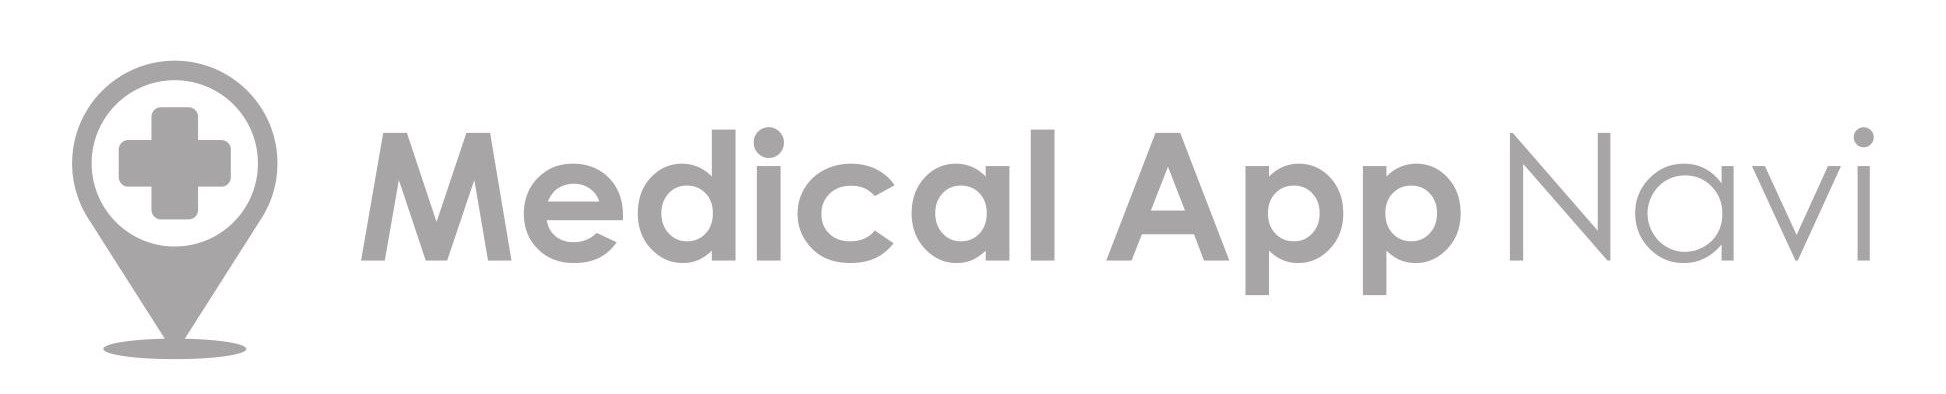 Medical App Navi (メディカルアプリナビ)